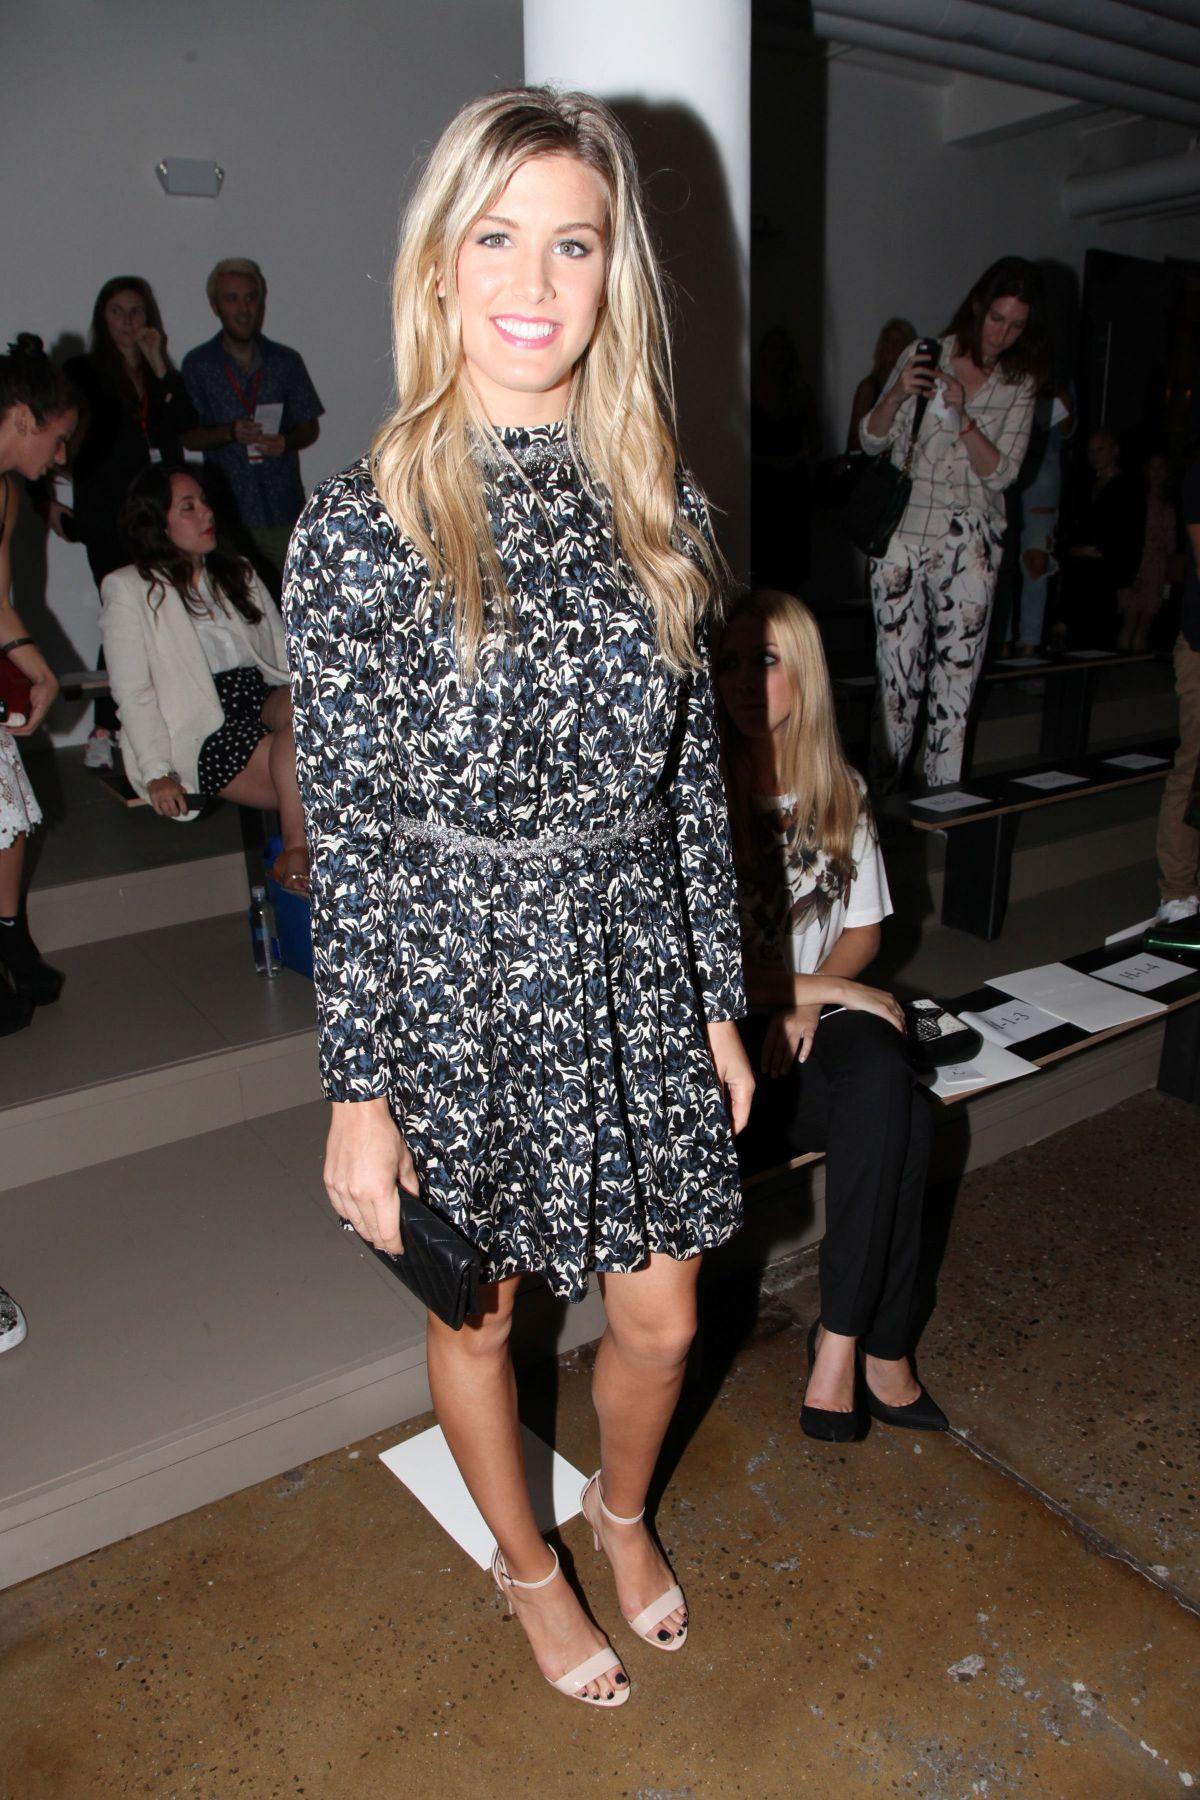 EUGENIE BOUCHARD at Cushnie Et Ochs Fashion Show in New York